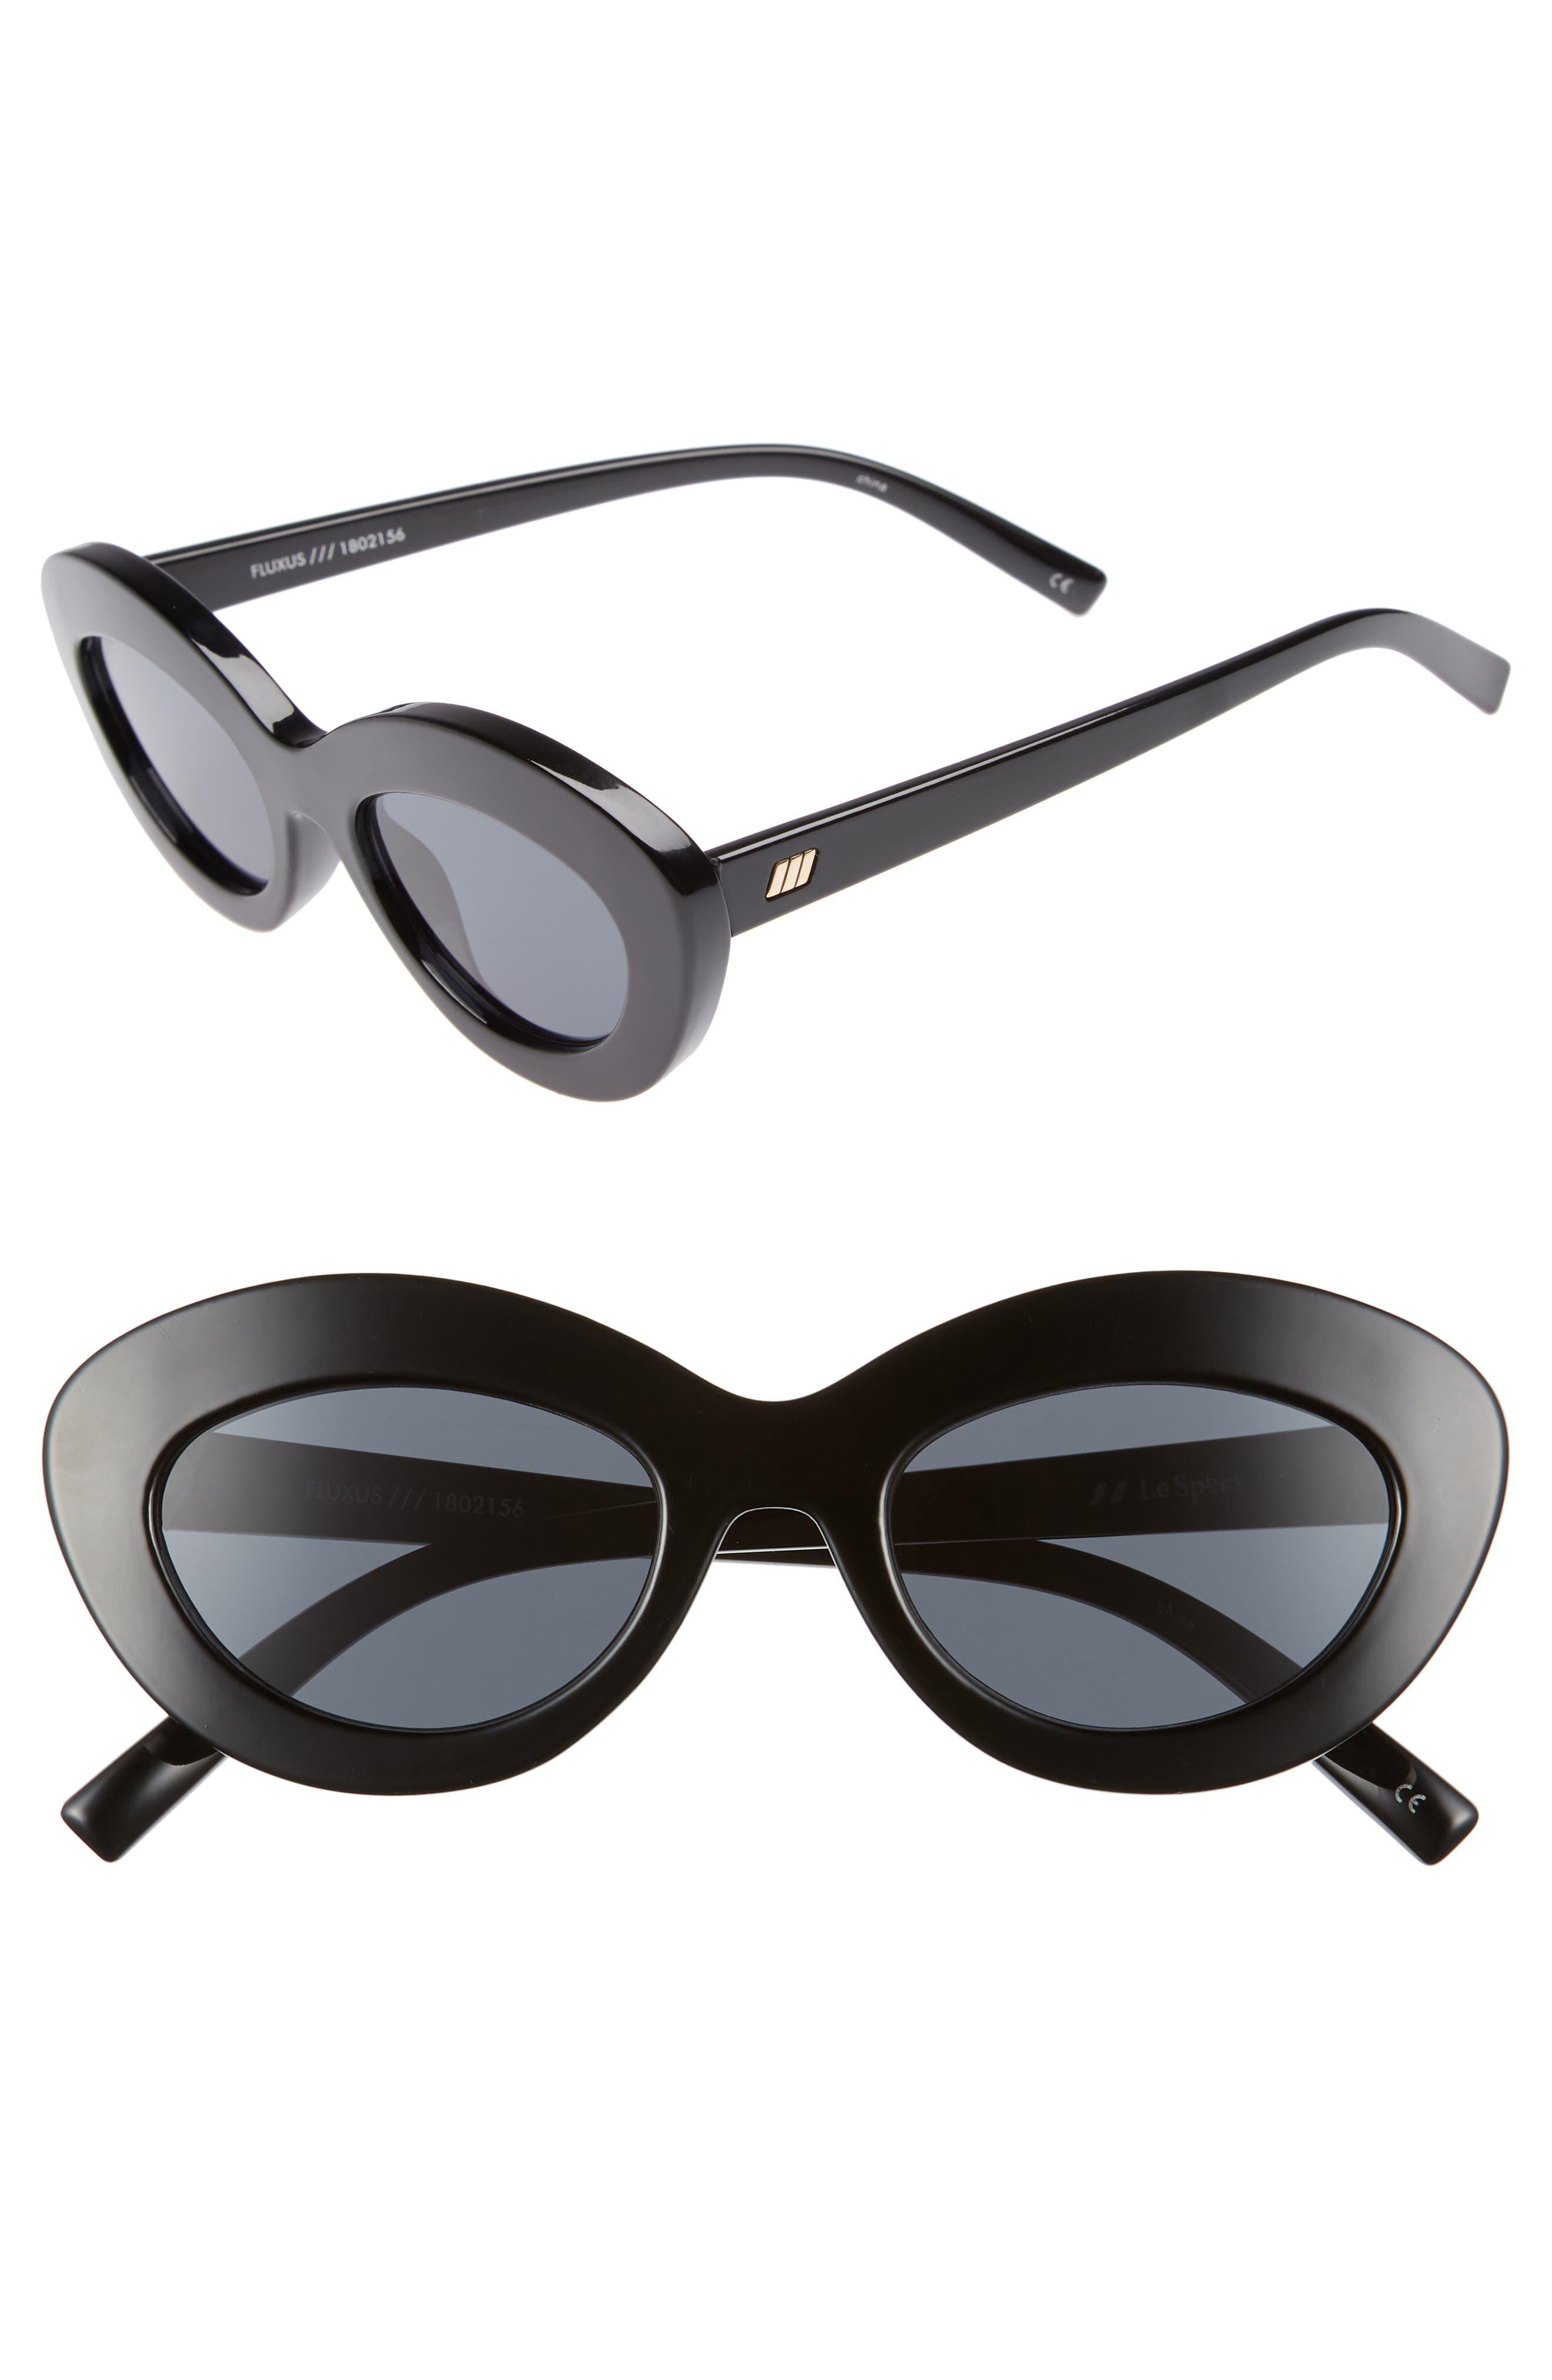 Le Specs Fluxus 4m Cat Eye Sunglasses - Black